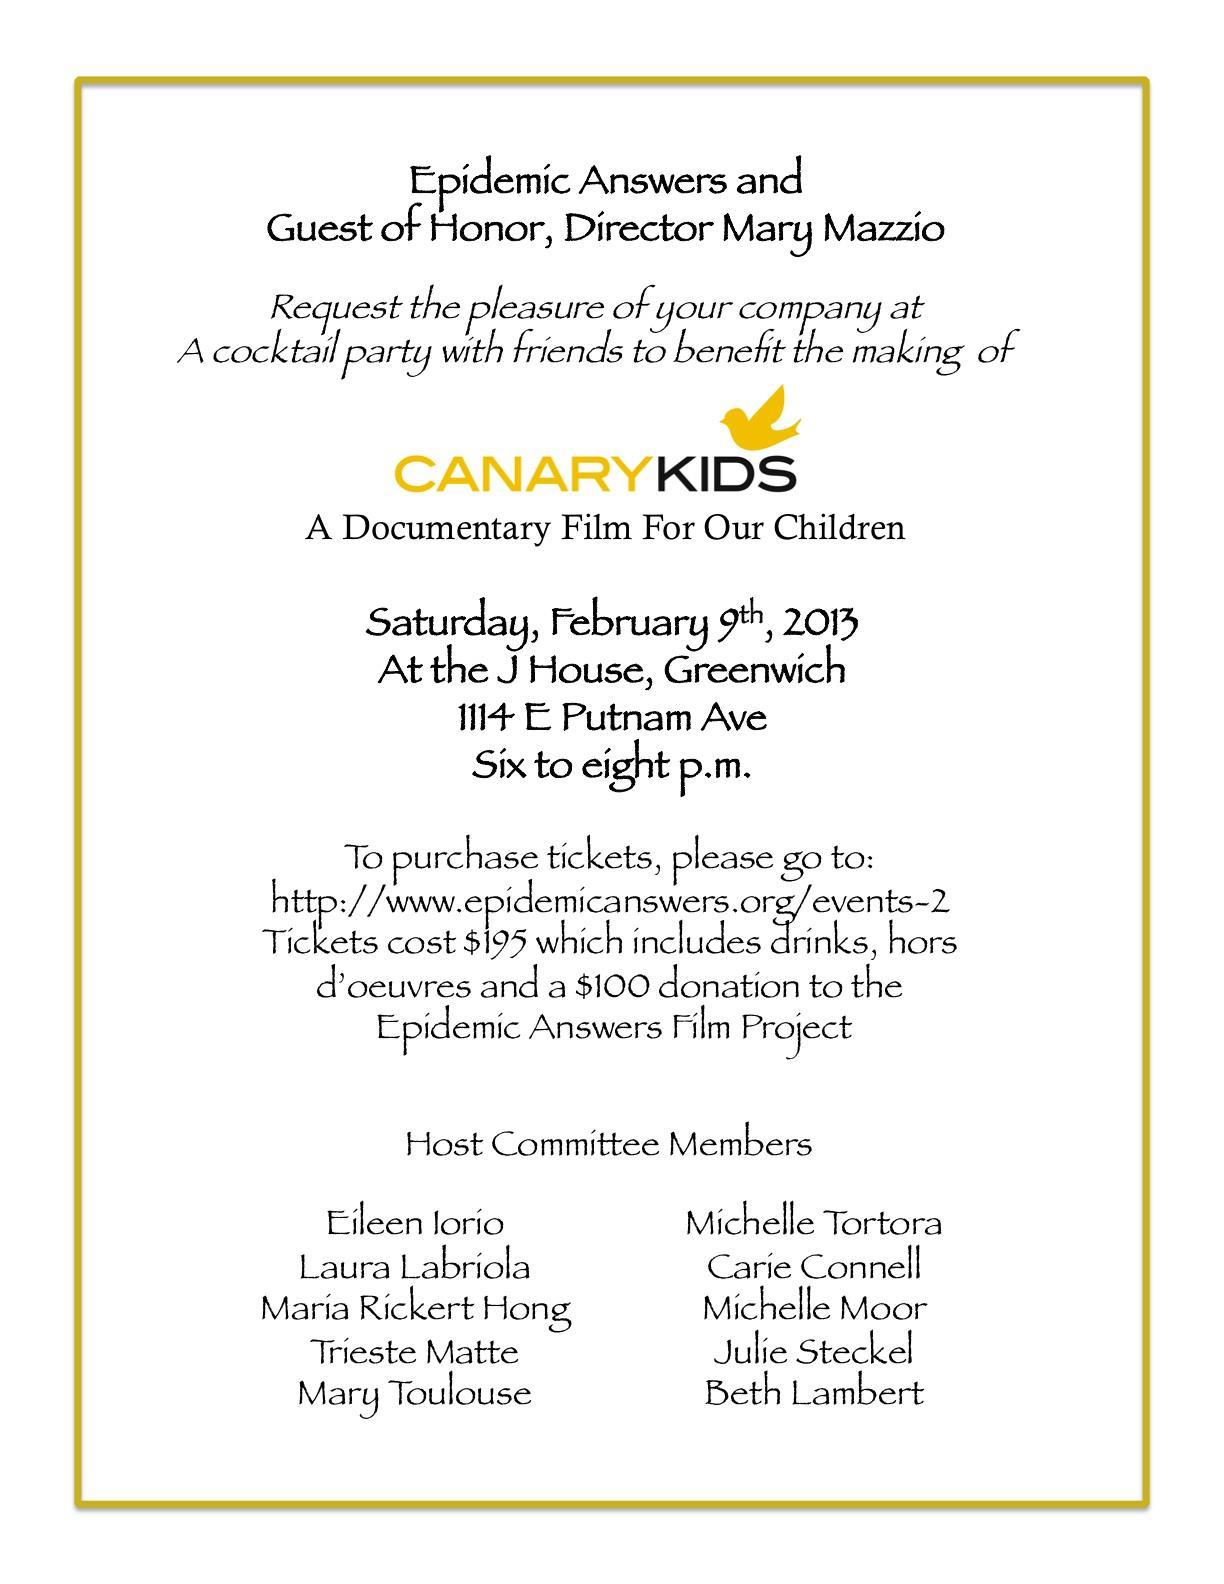 Fundraiser Event Invitation Wording Samples Wedding Invitation – Fundraising Invitation Samples